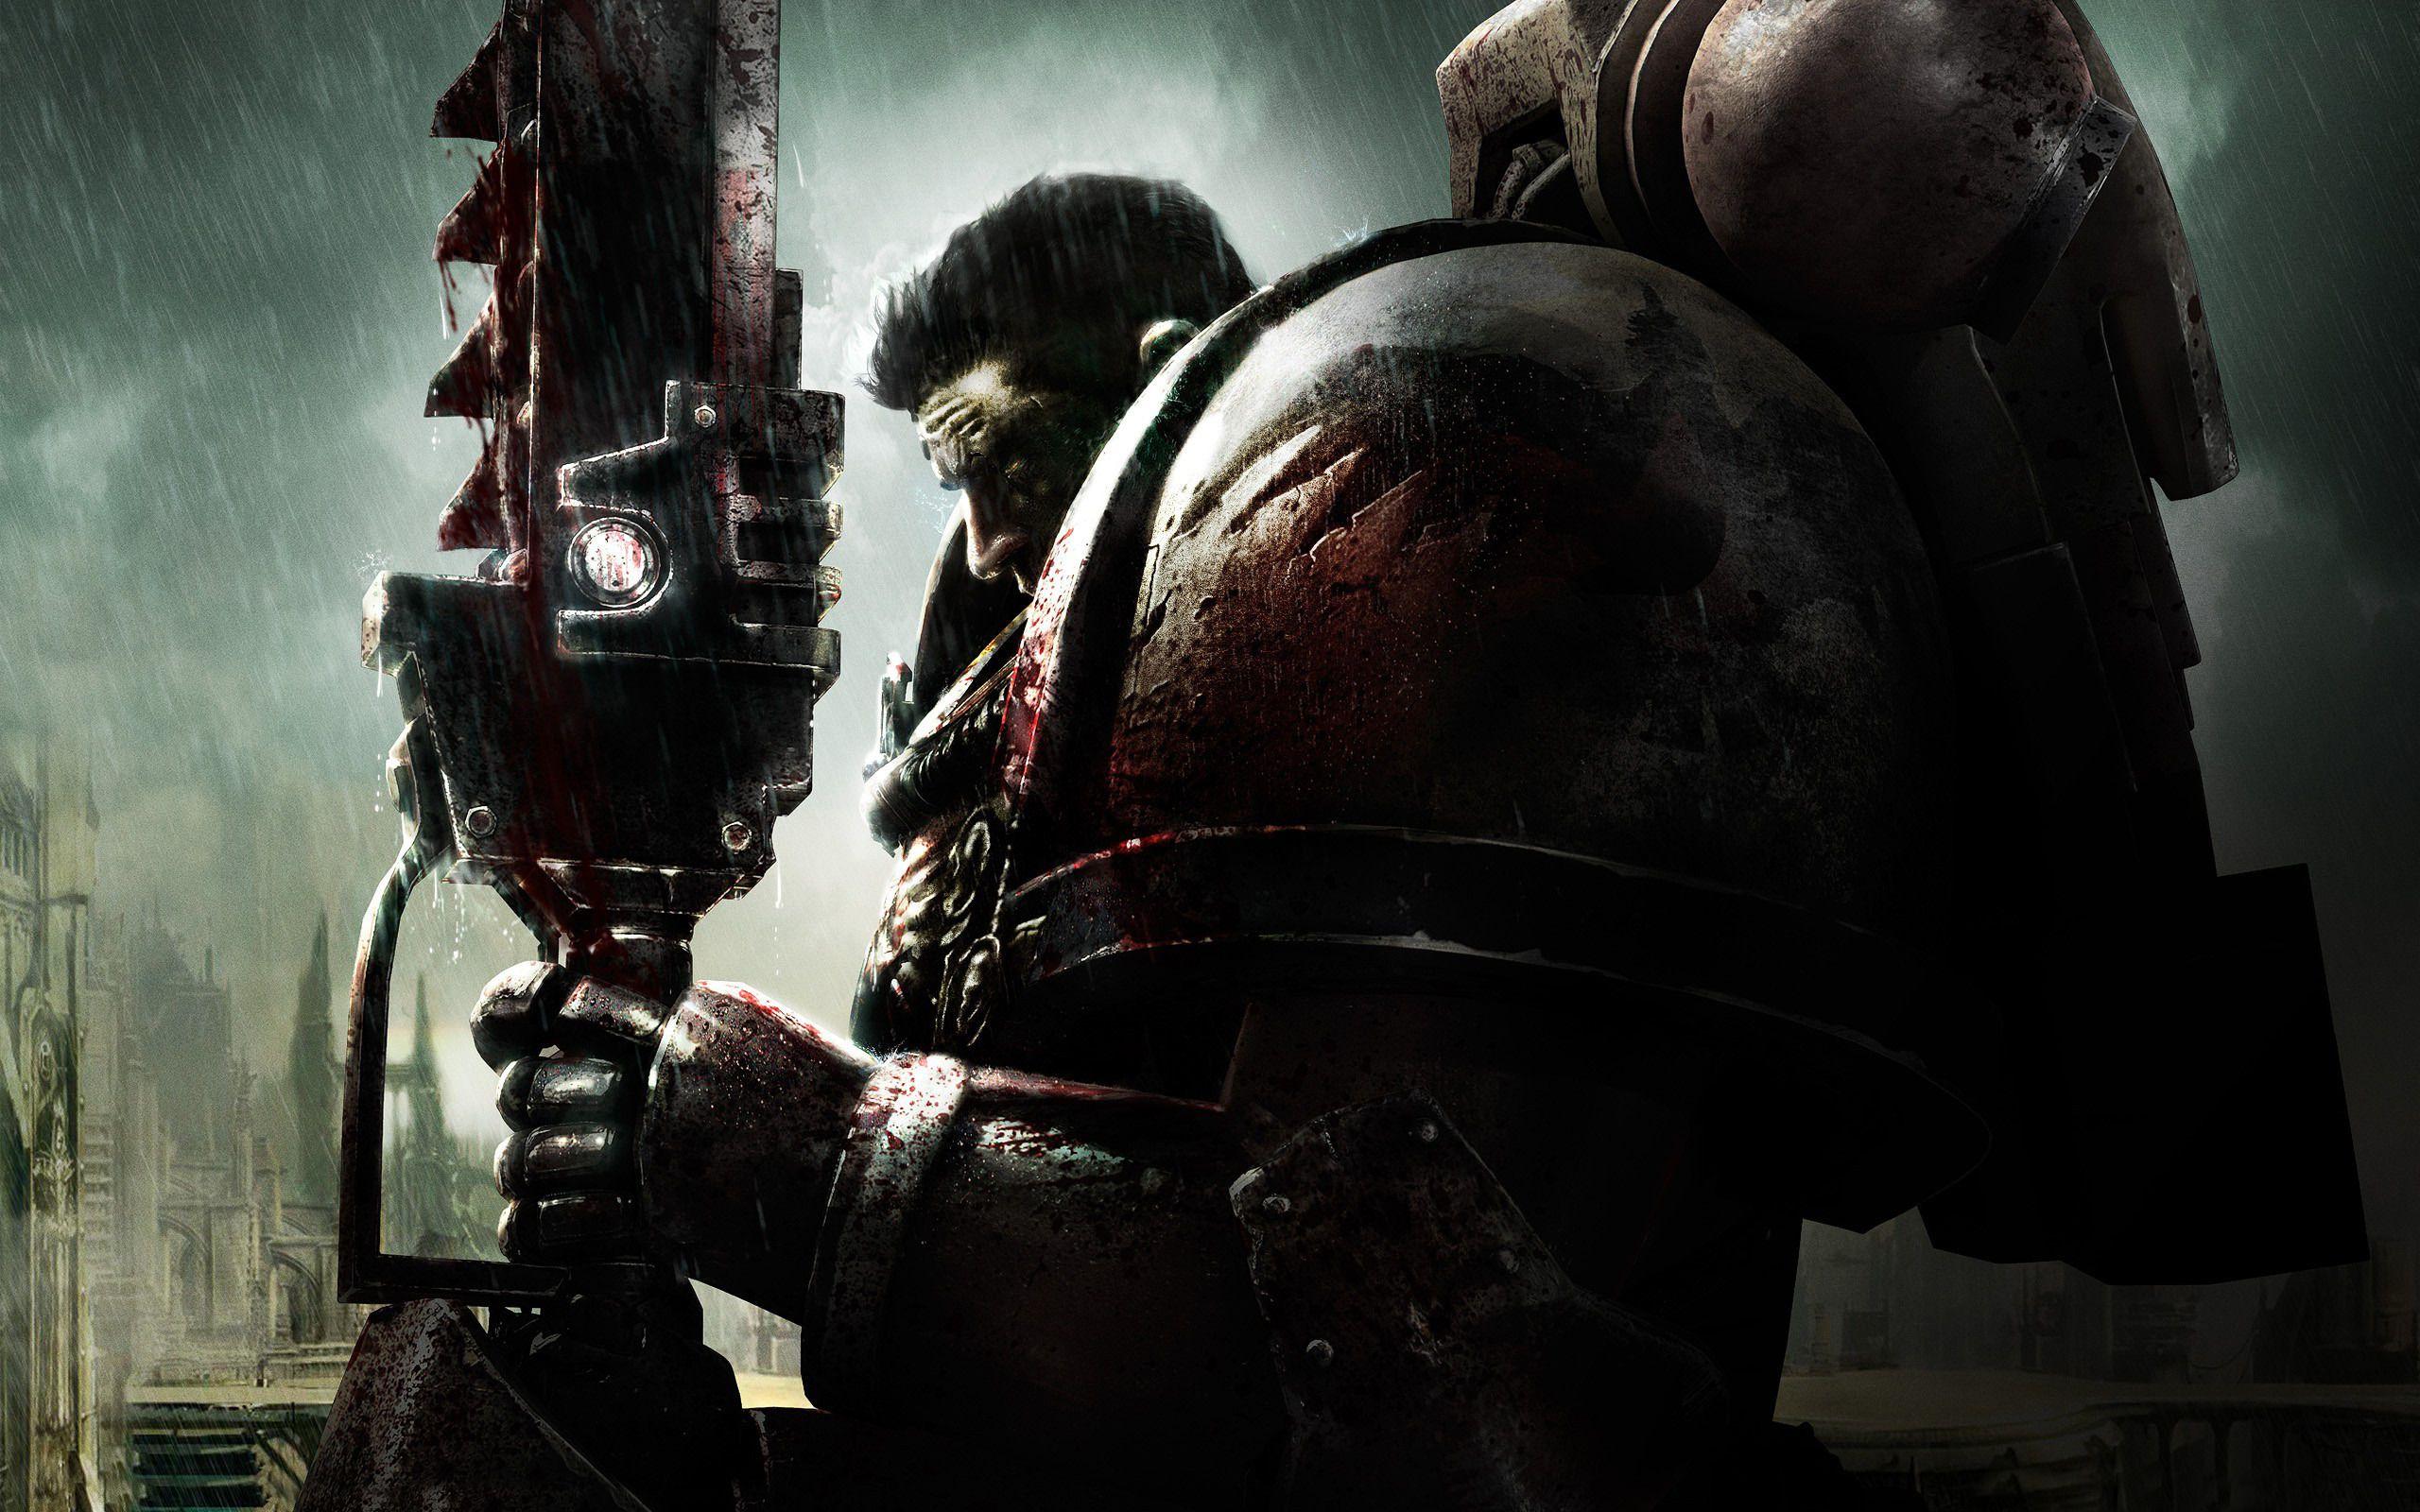 Warhammer 40k Wallpaper 1080p - Google Search